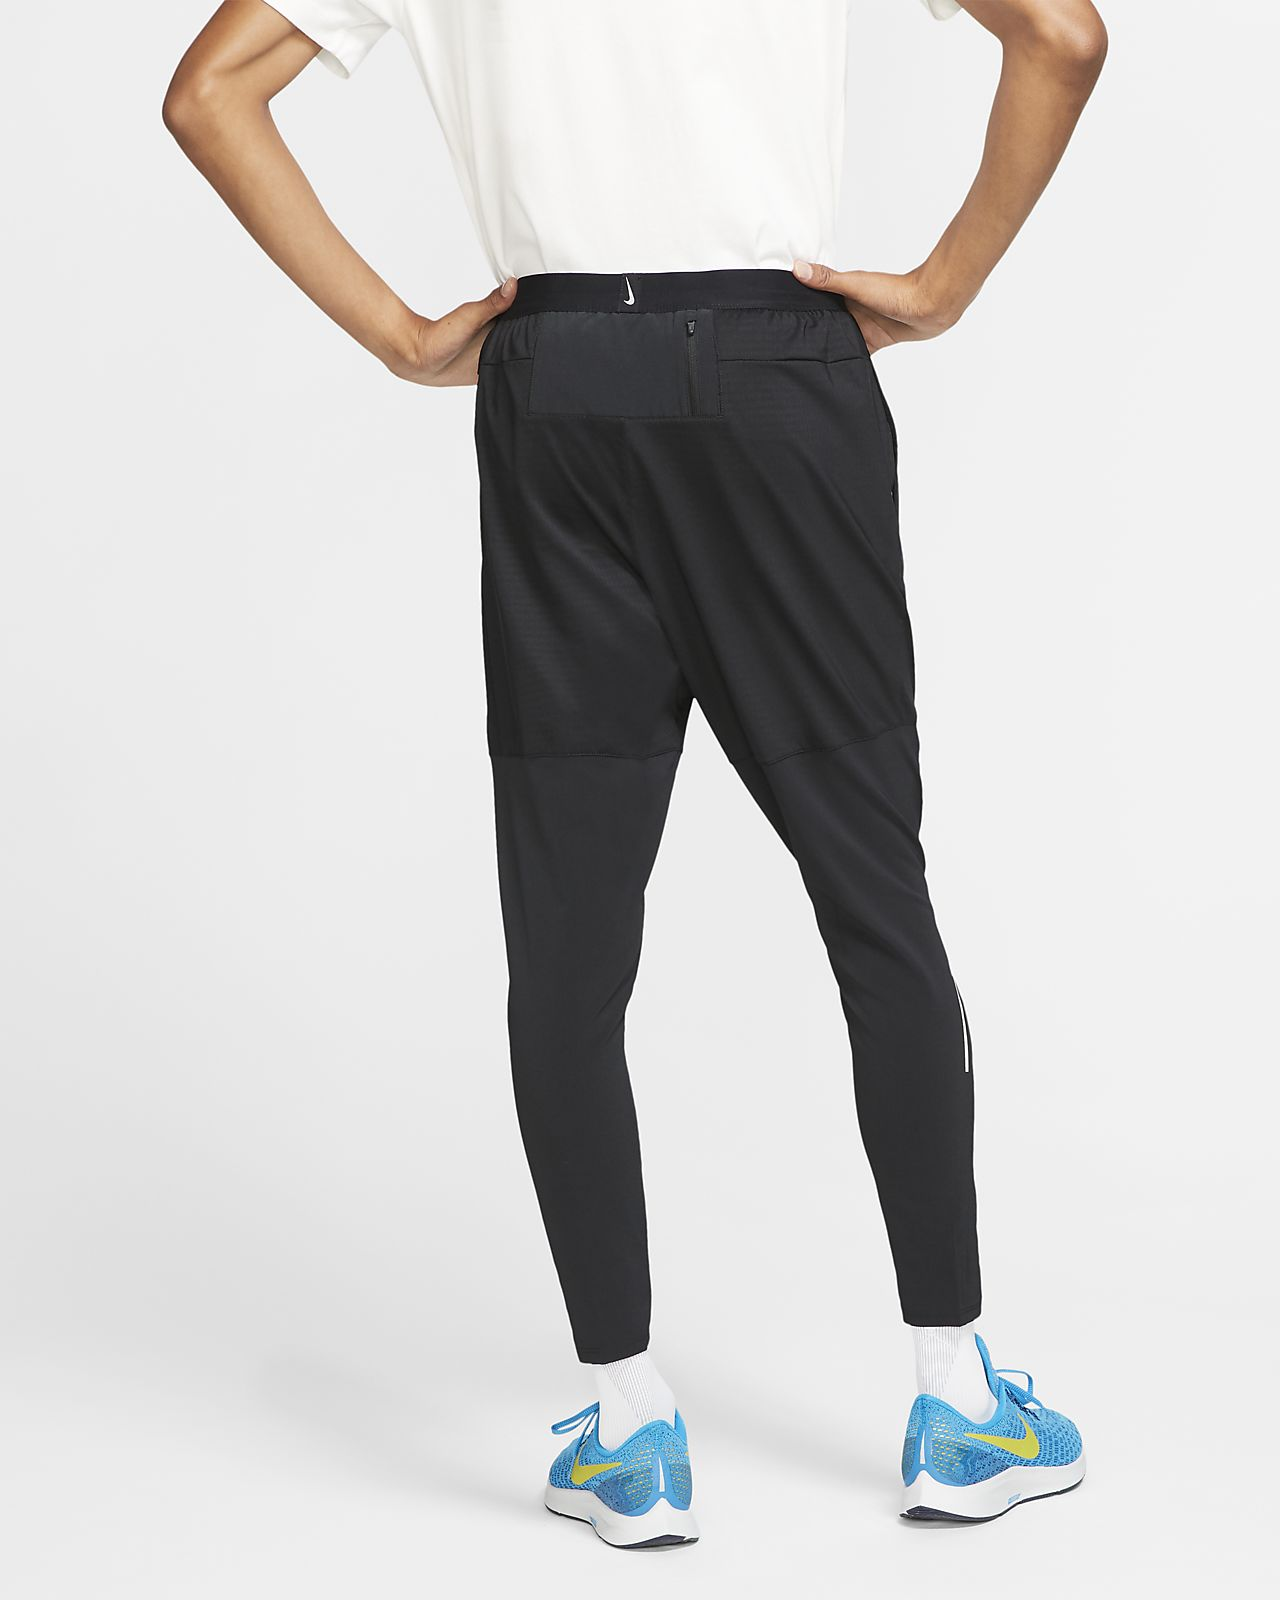 pantaloni corsa nike